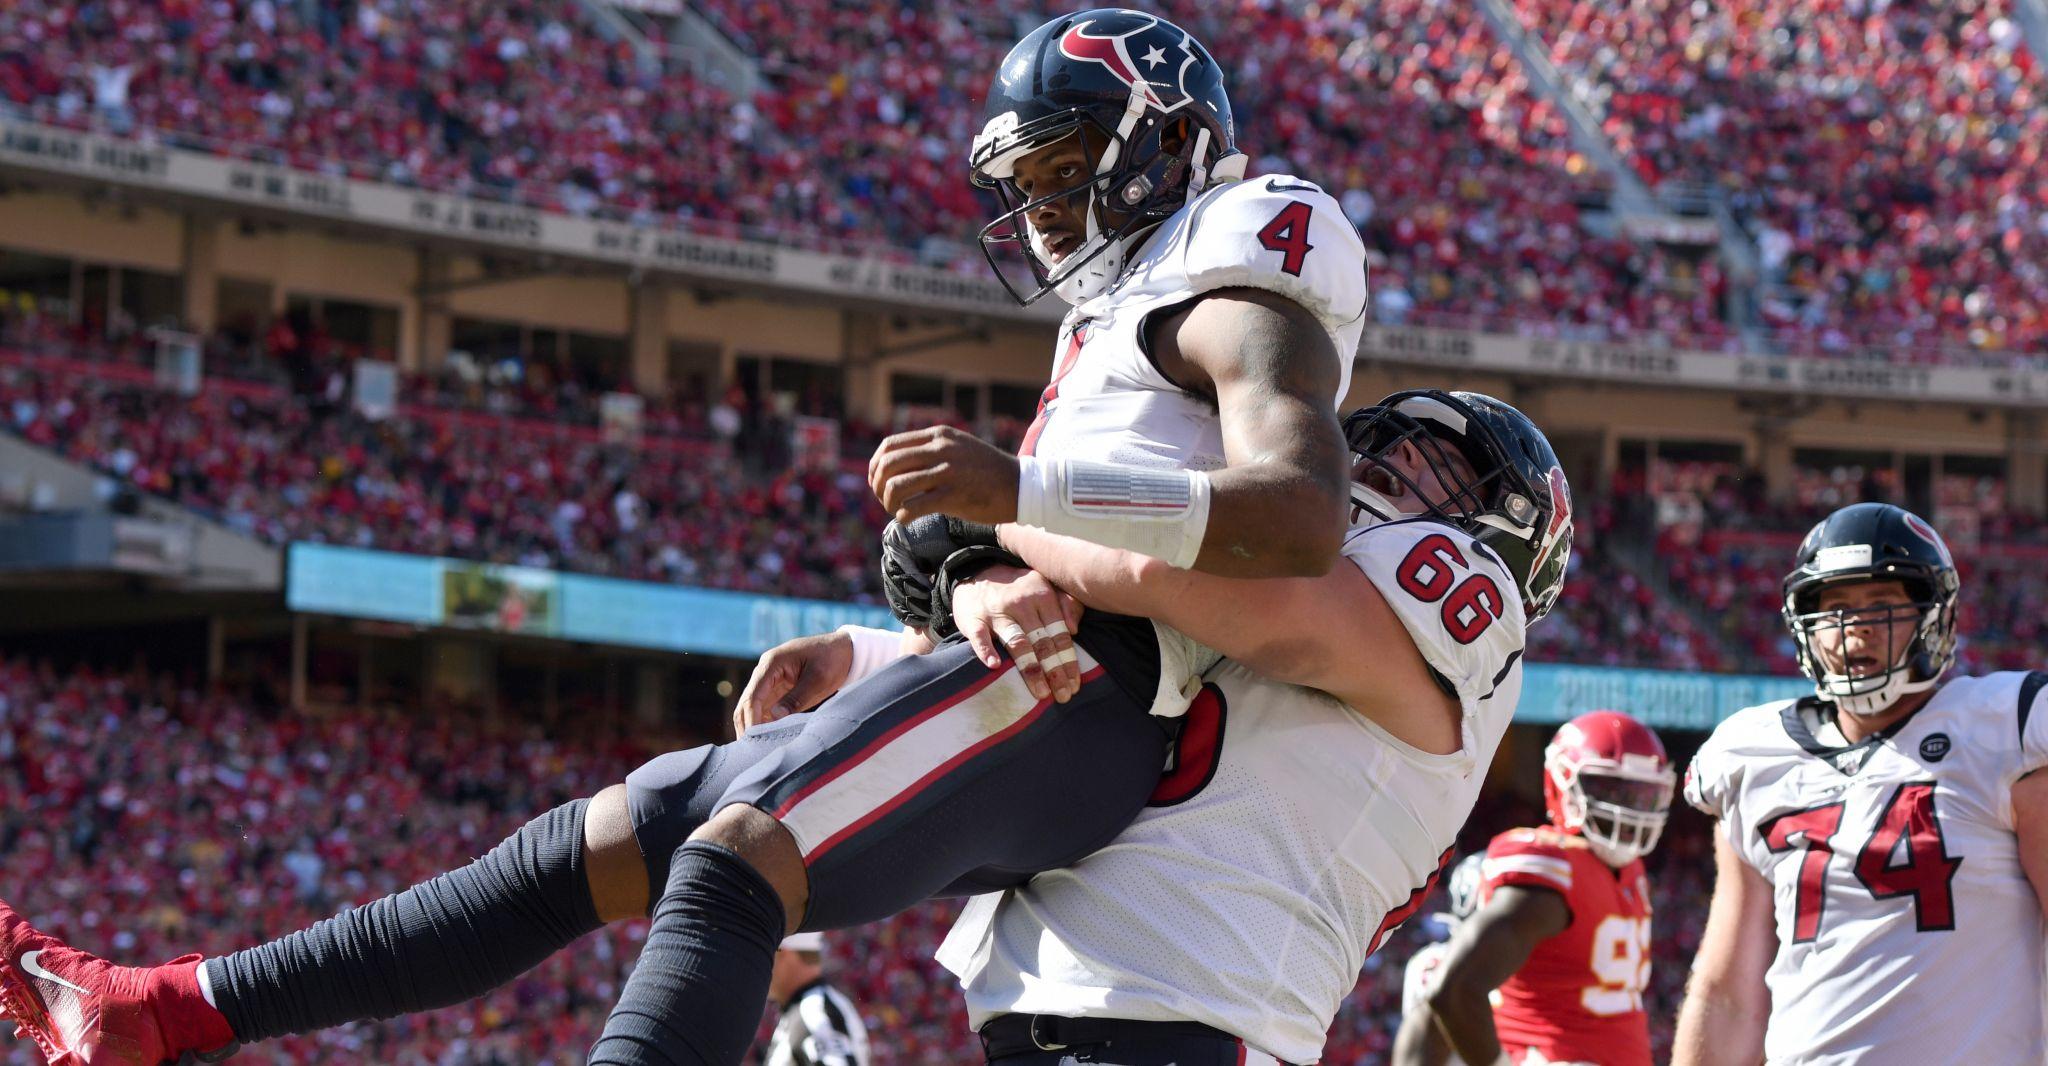 Deshaun Watson, Texans get statement win over Chiefs